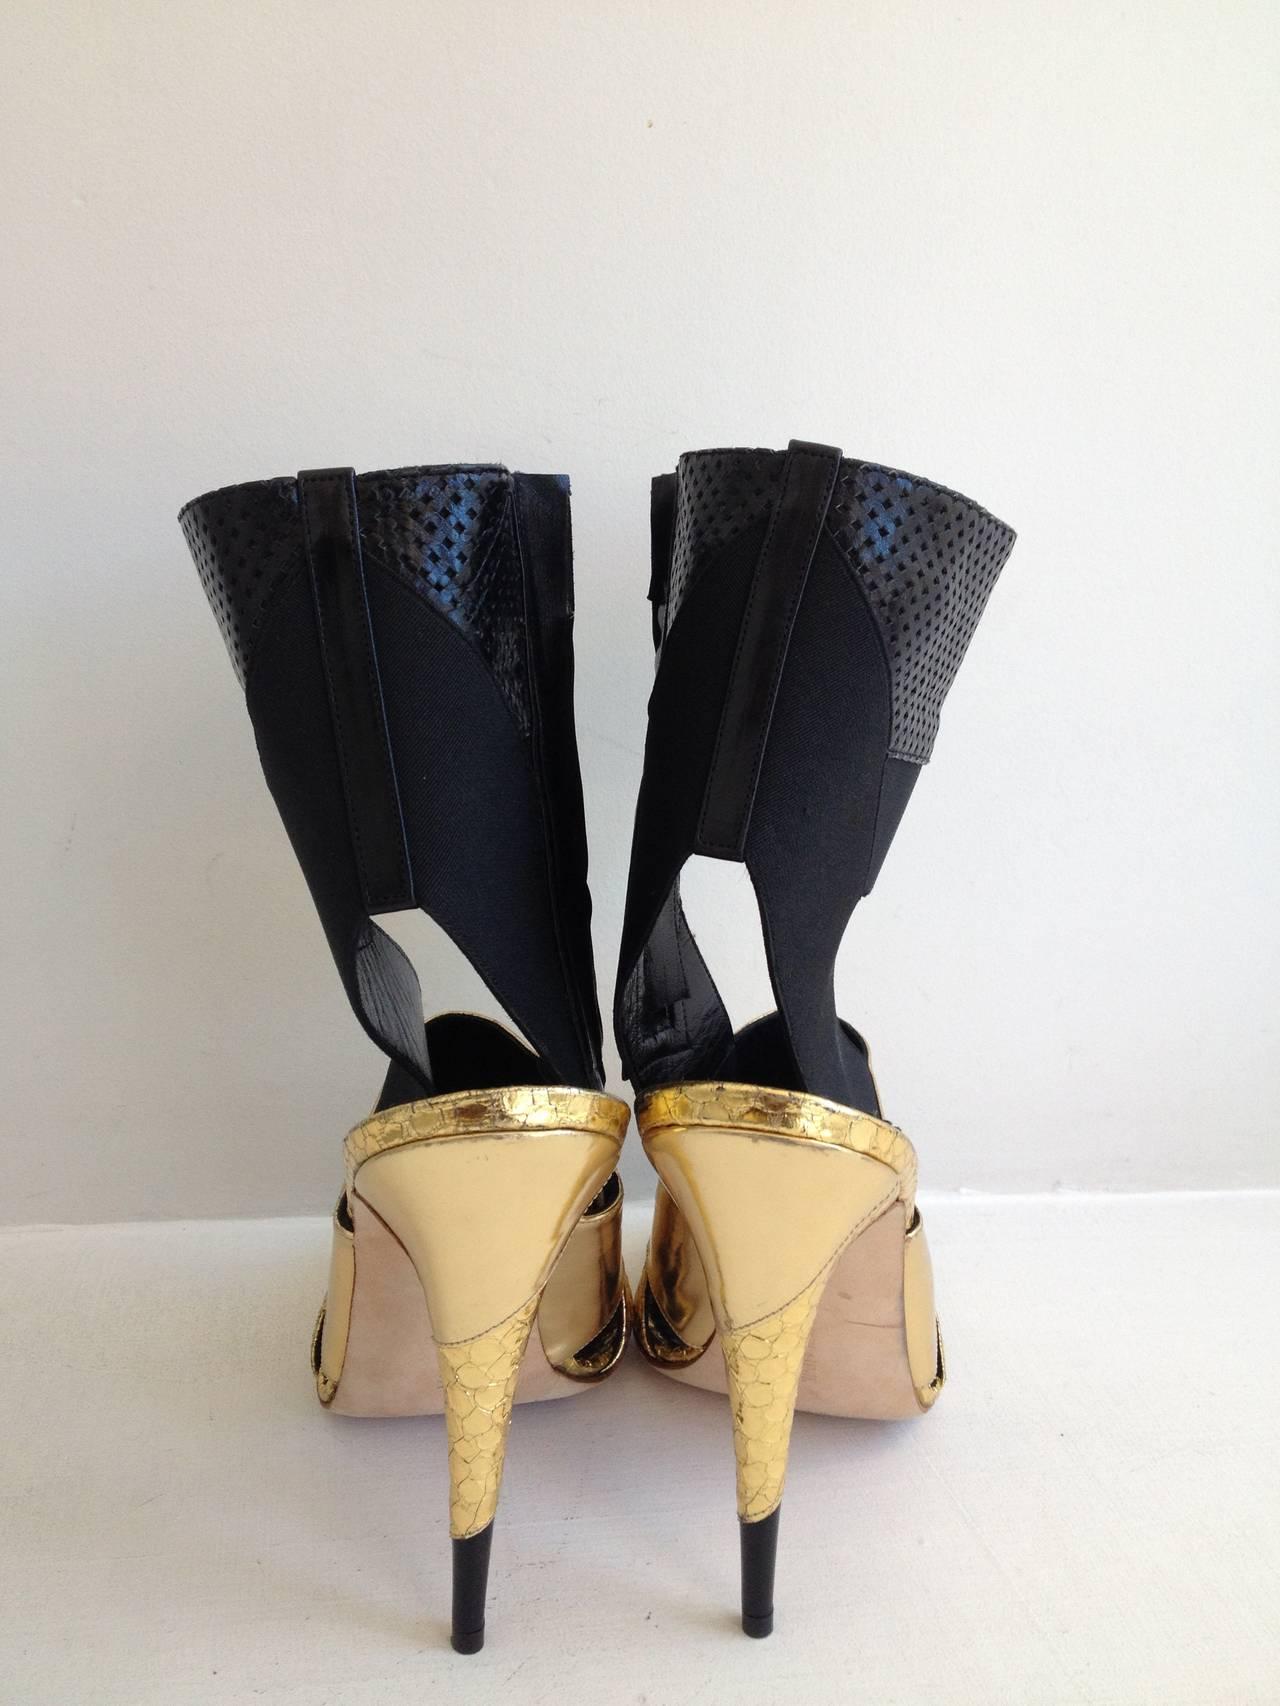 Manolo Blahnik Black and Gold Metallic Heels 3